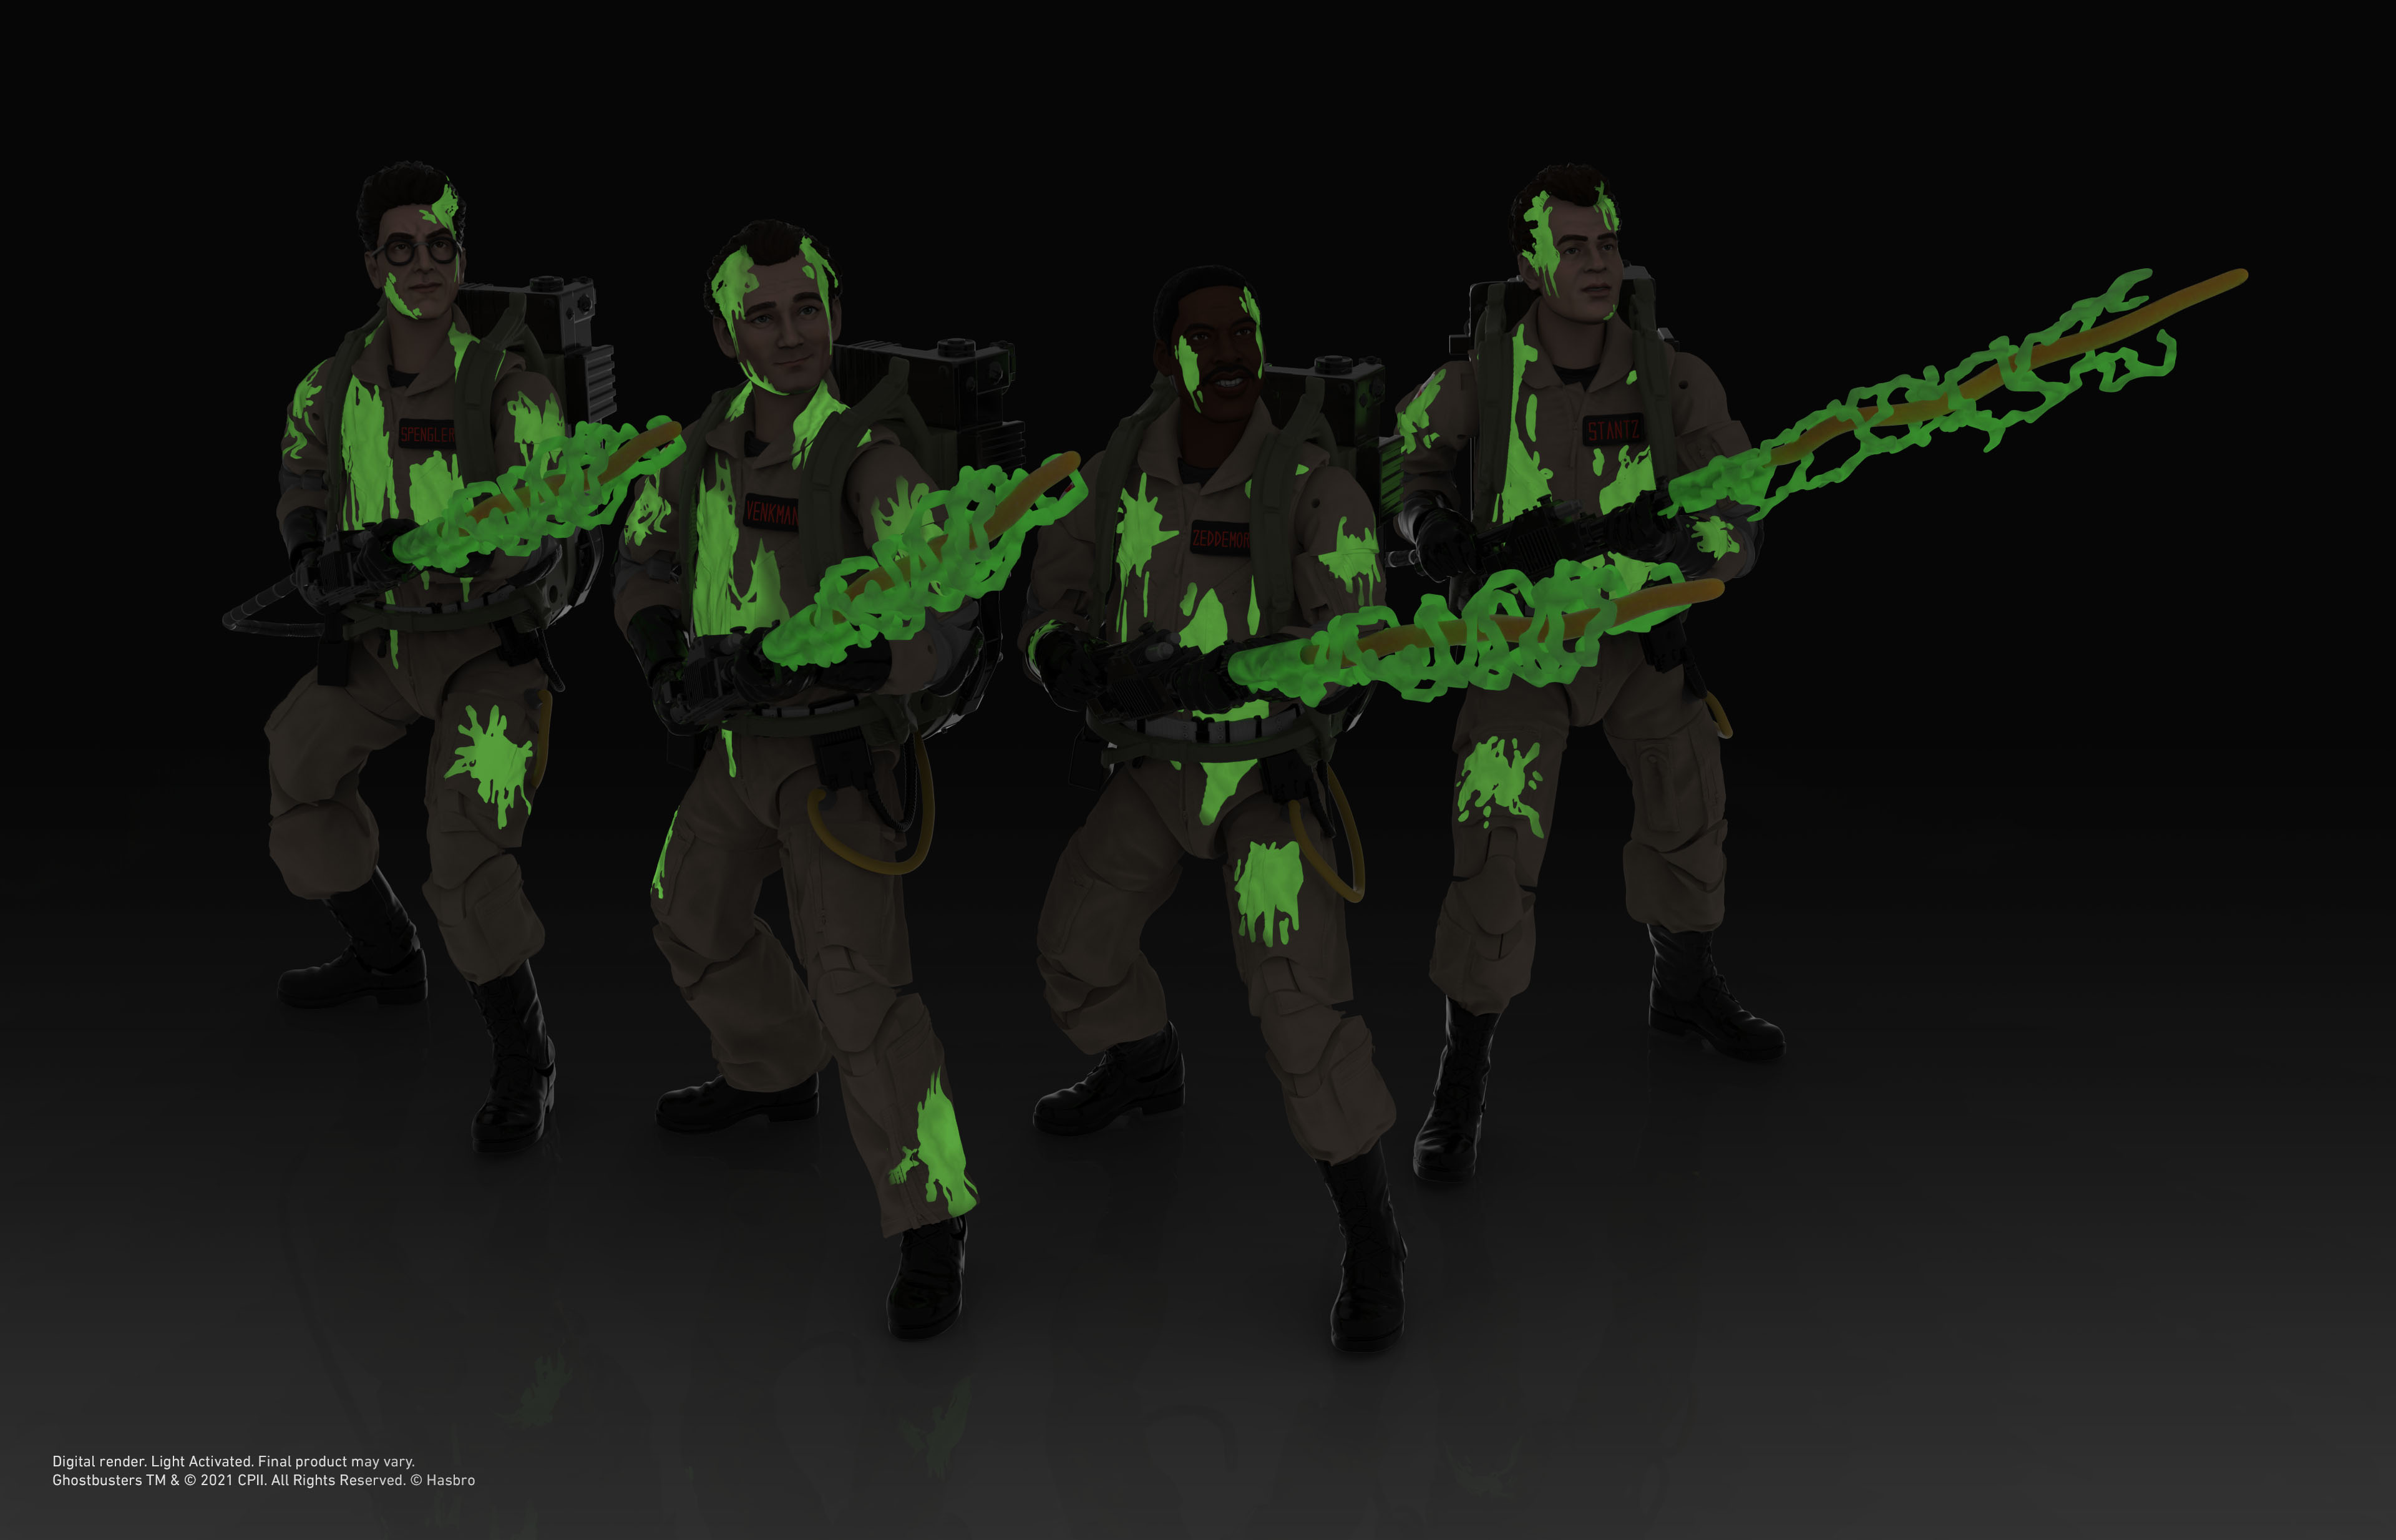 Link a Peter Venkman, Ray Stantz, Egon Spengler, and Winston Zeddemore – ghostbusters day – hasbro – glow in the dark – (3)